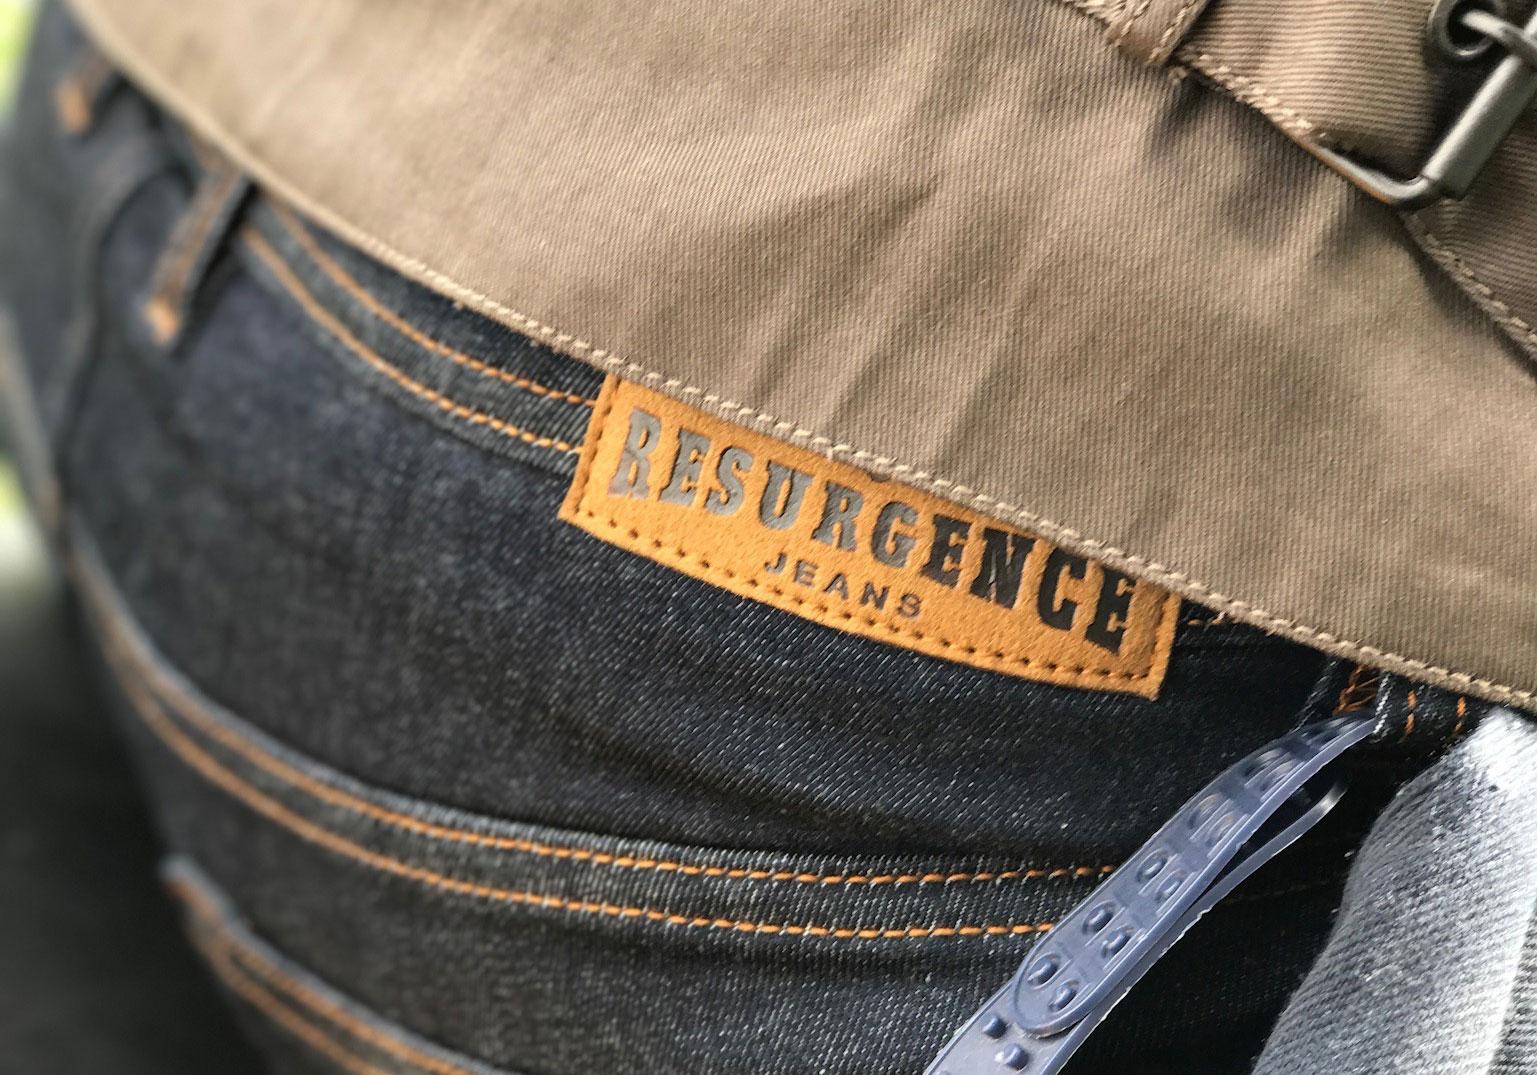 Resurgence Gear - Pekev jeans - Guide to buy motorcycle clothing gear